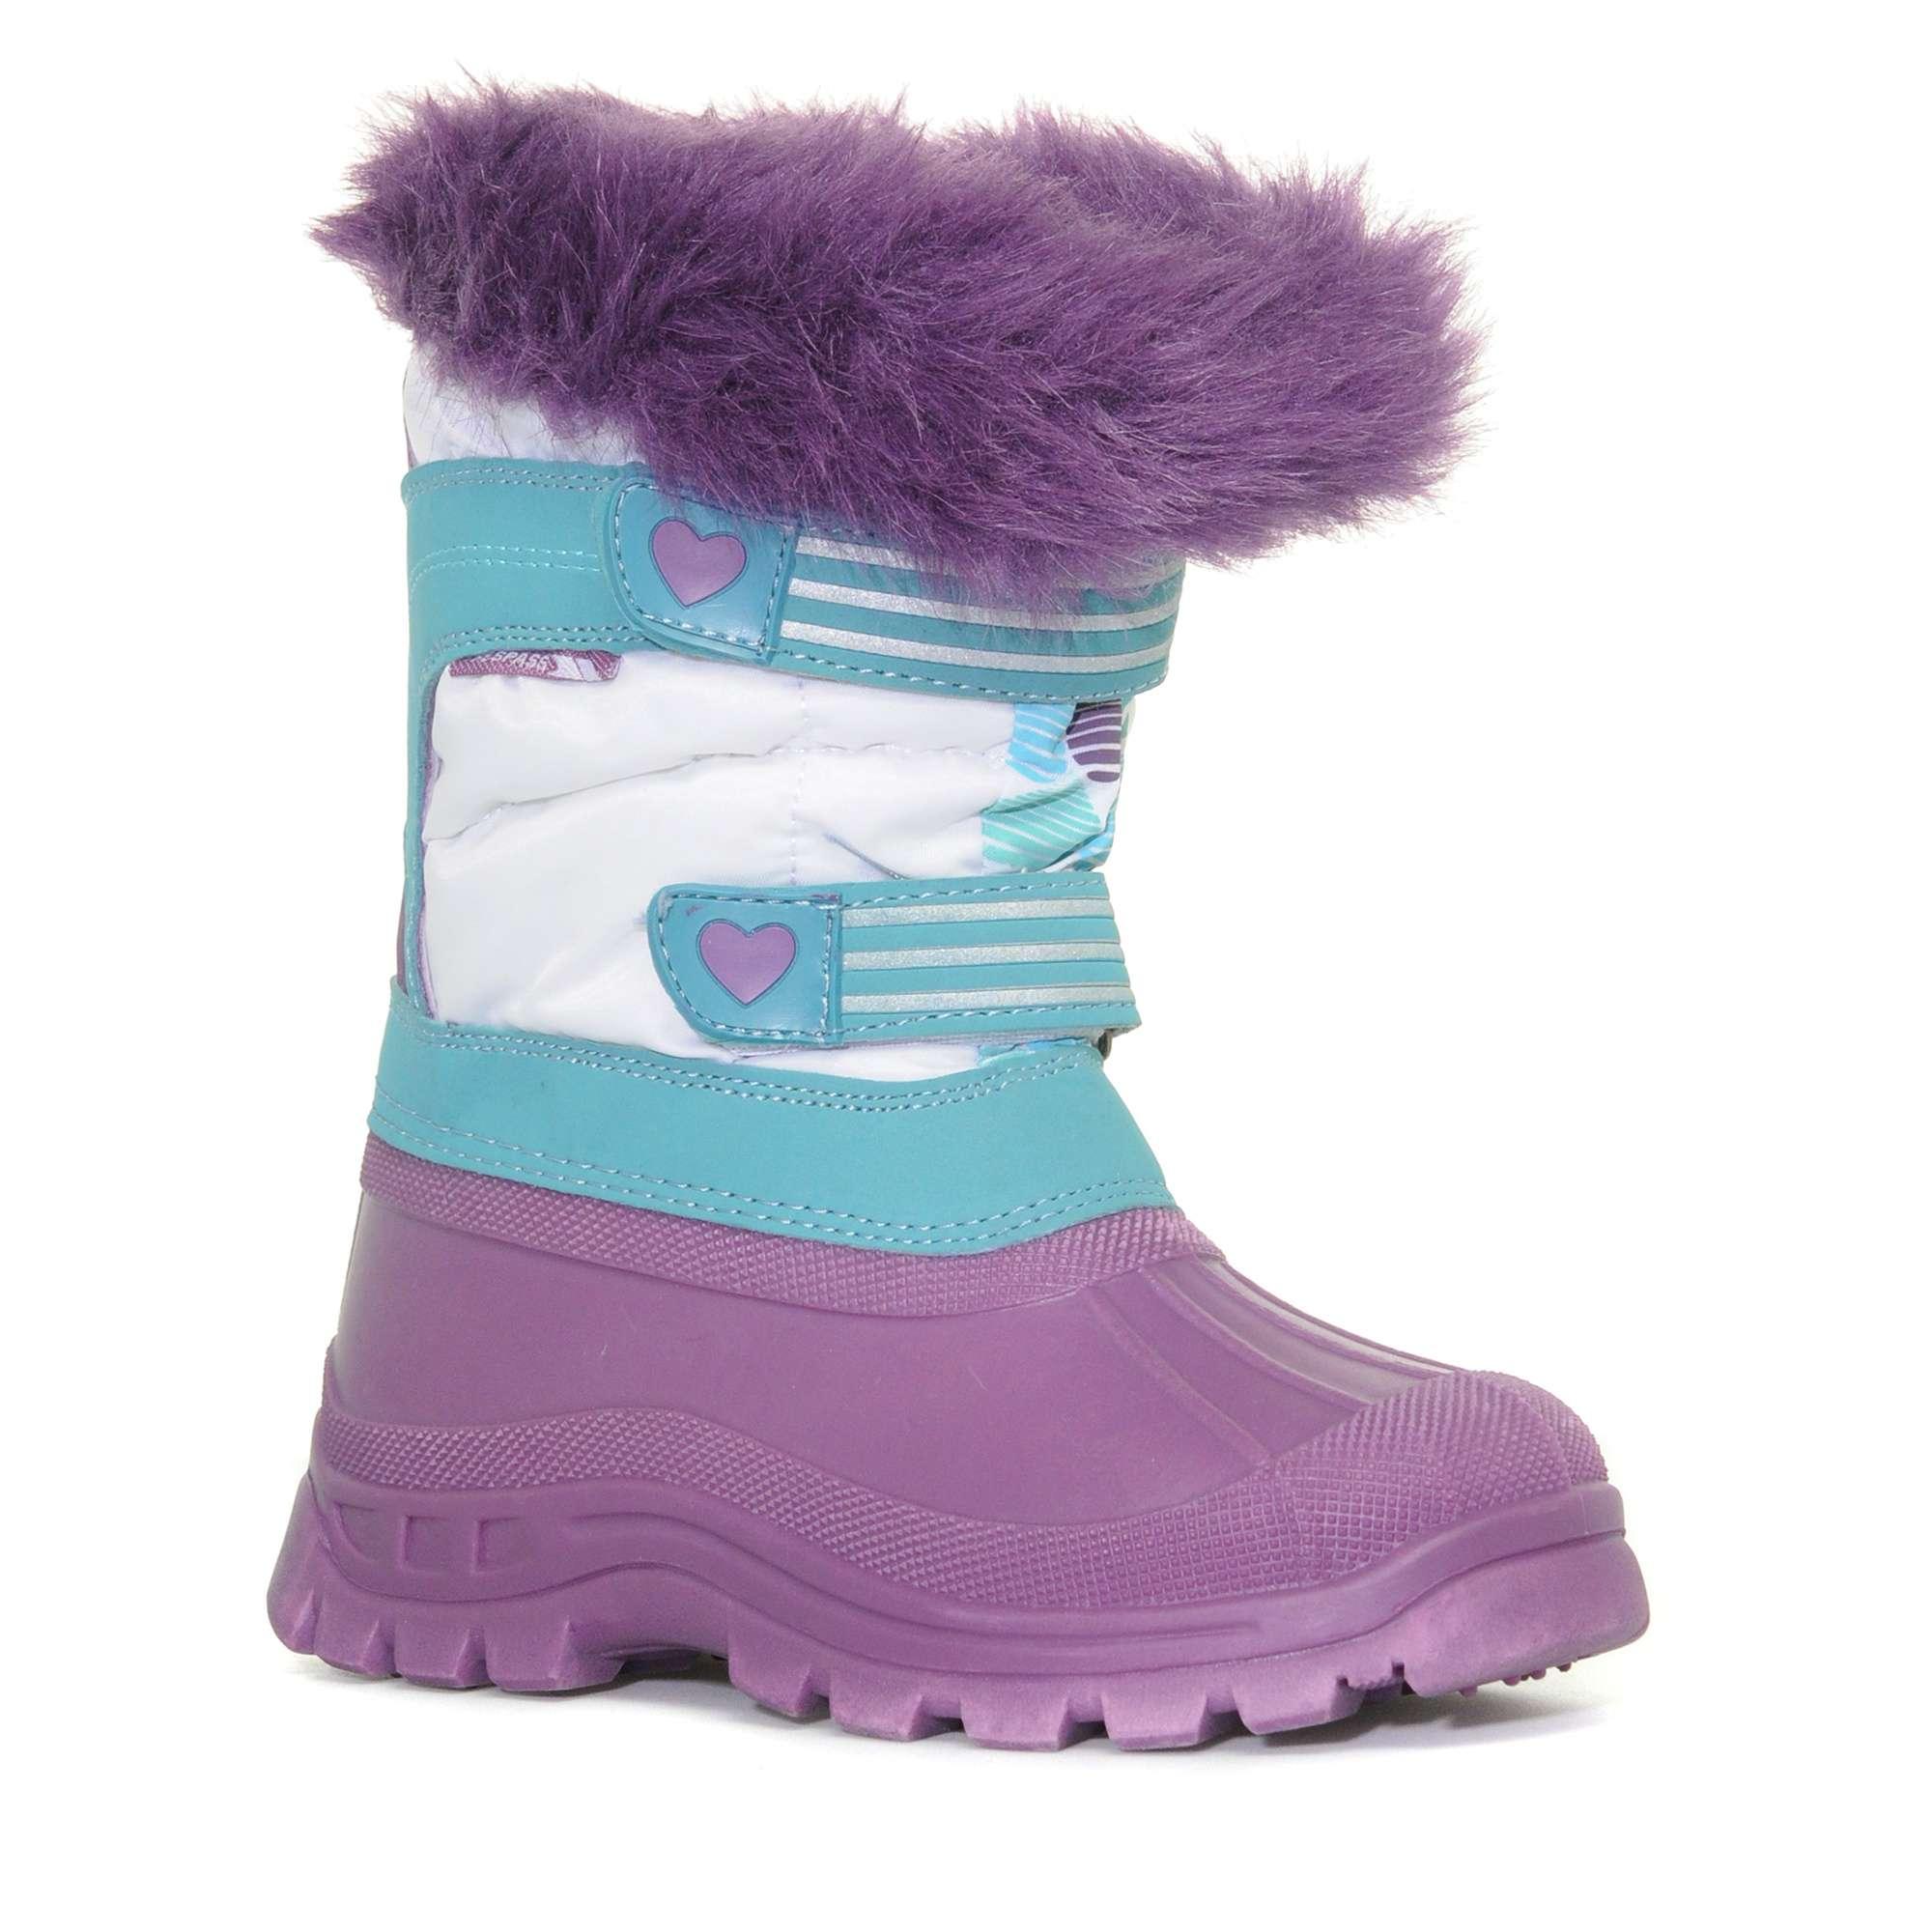 TRESPASS Girls Frost Apres Ski